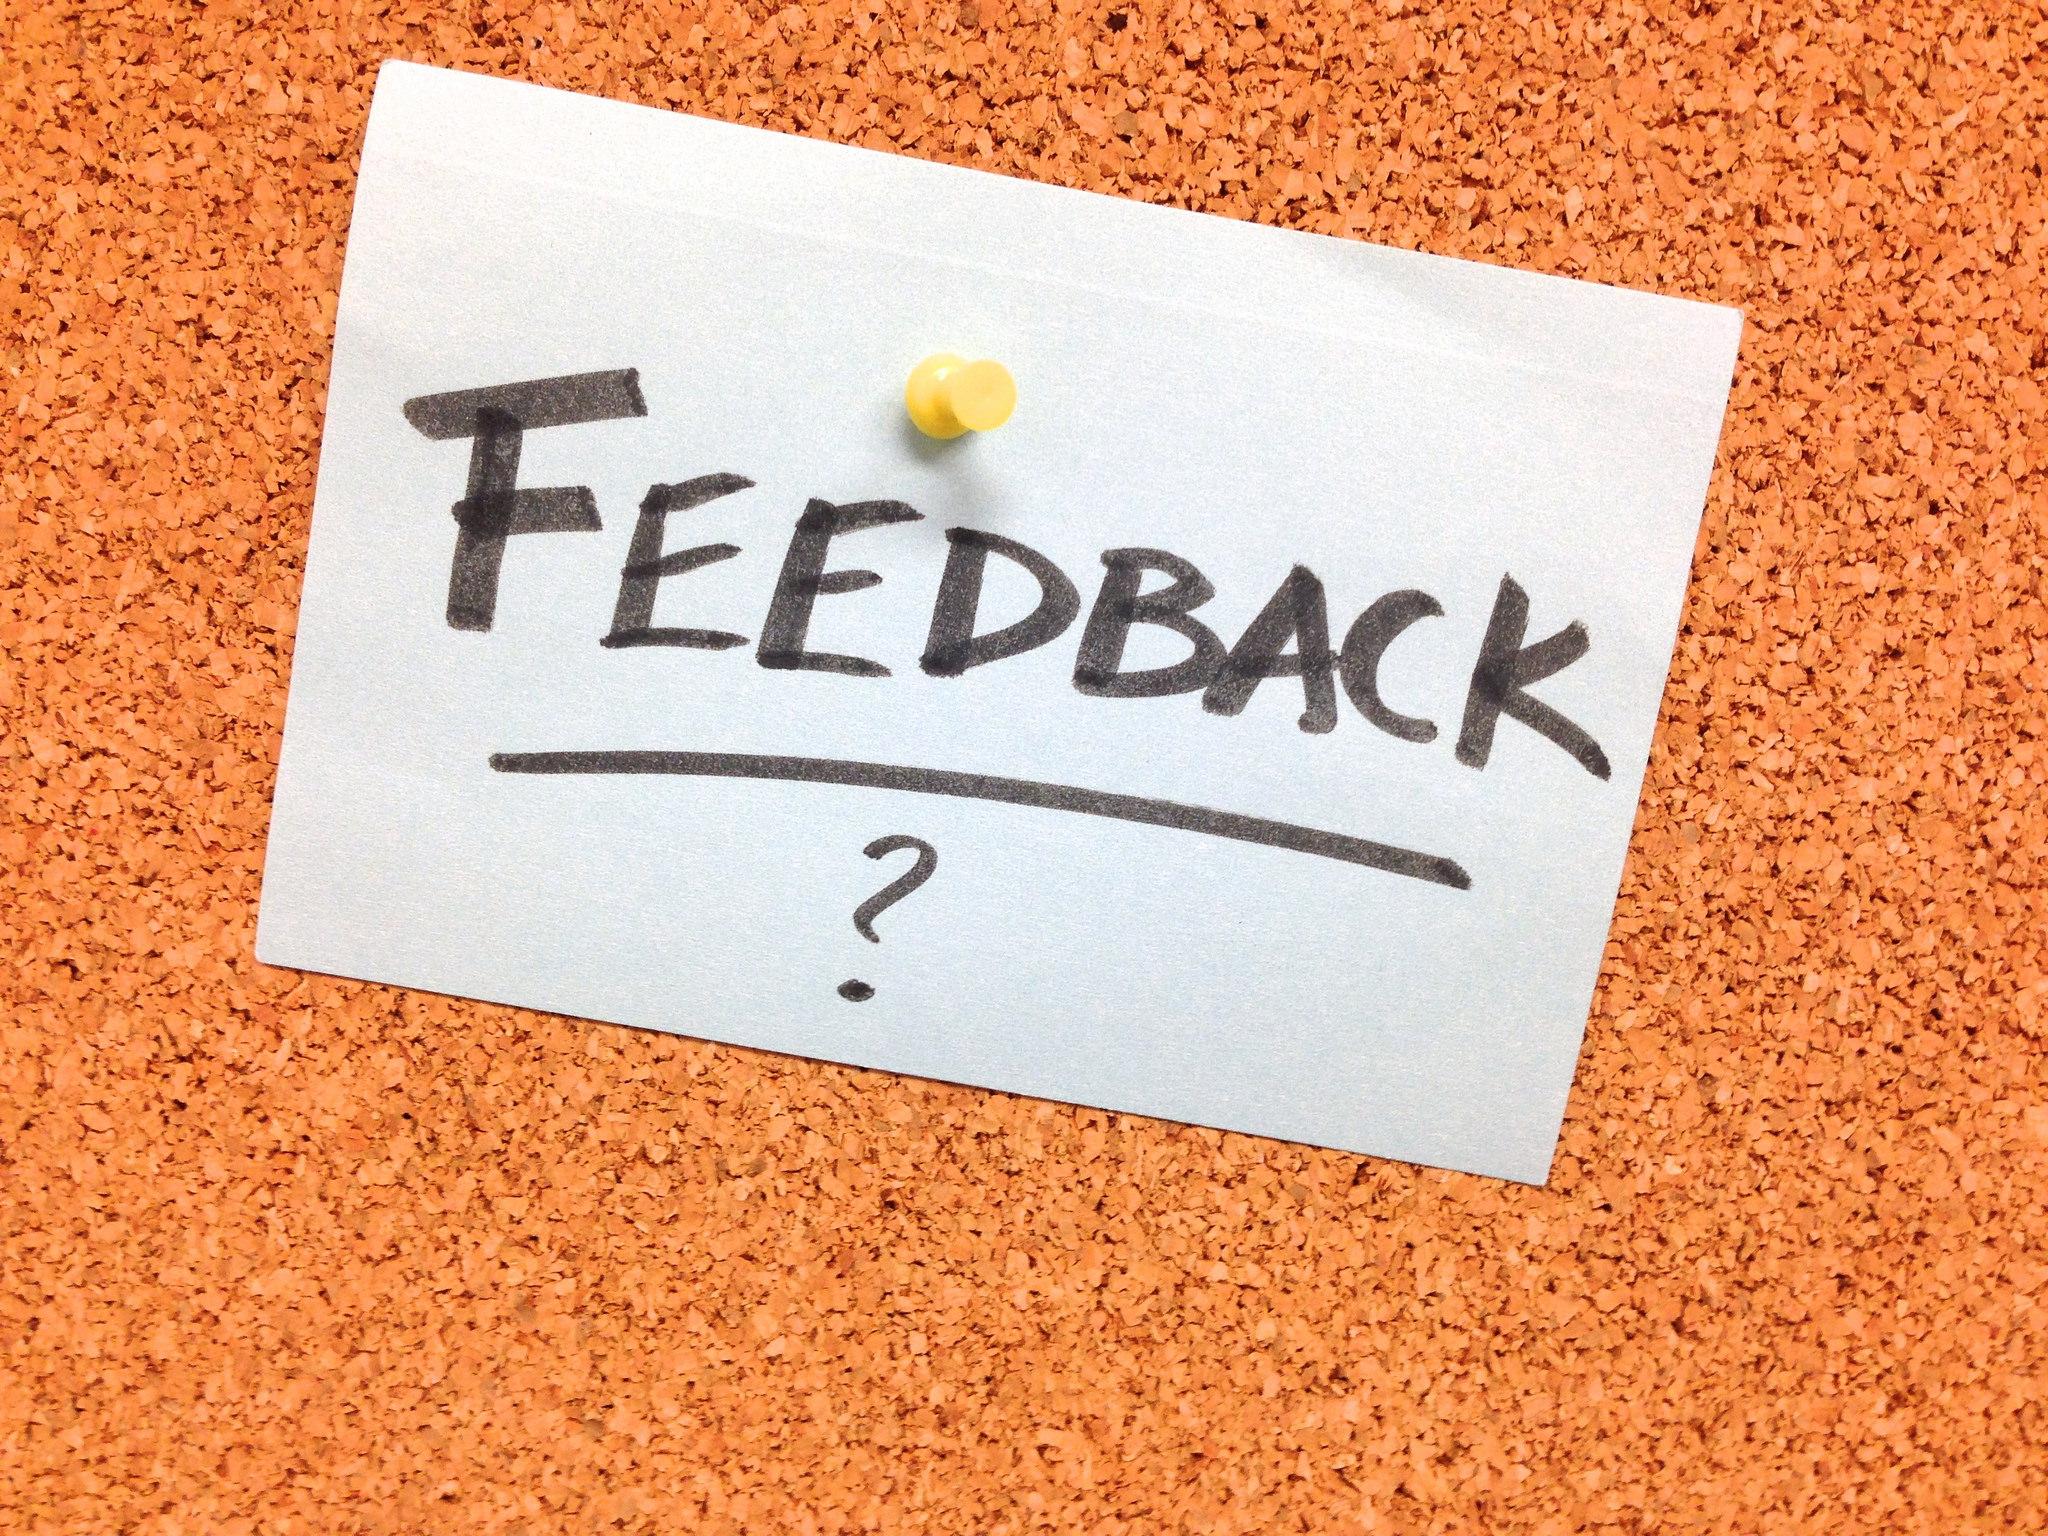 feedbackk survey